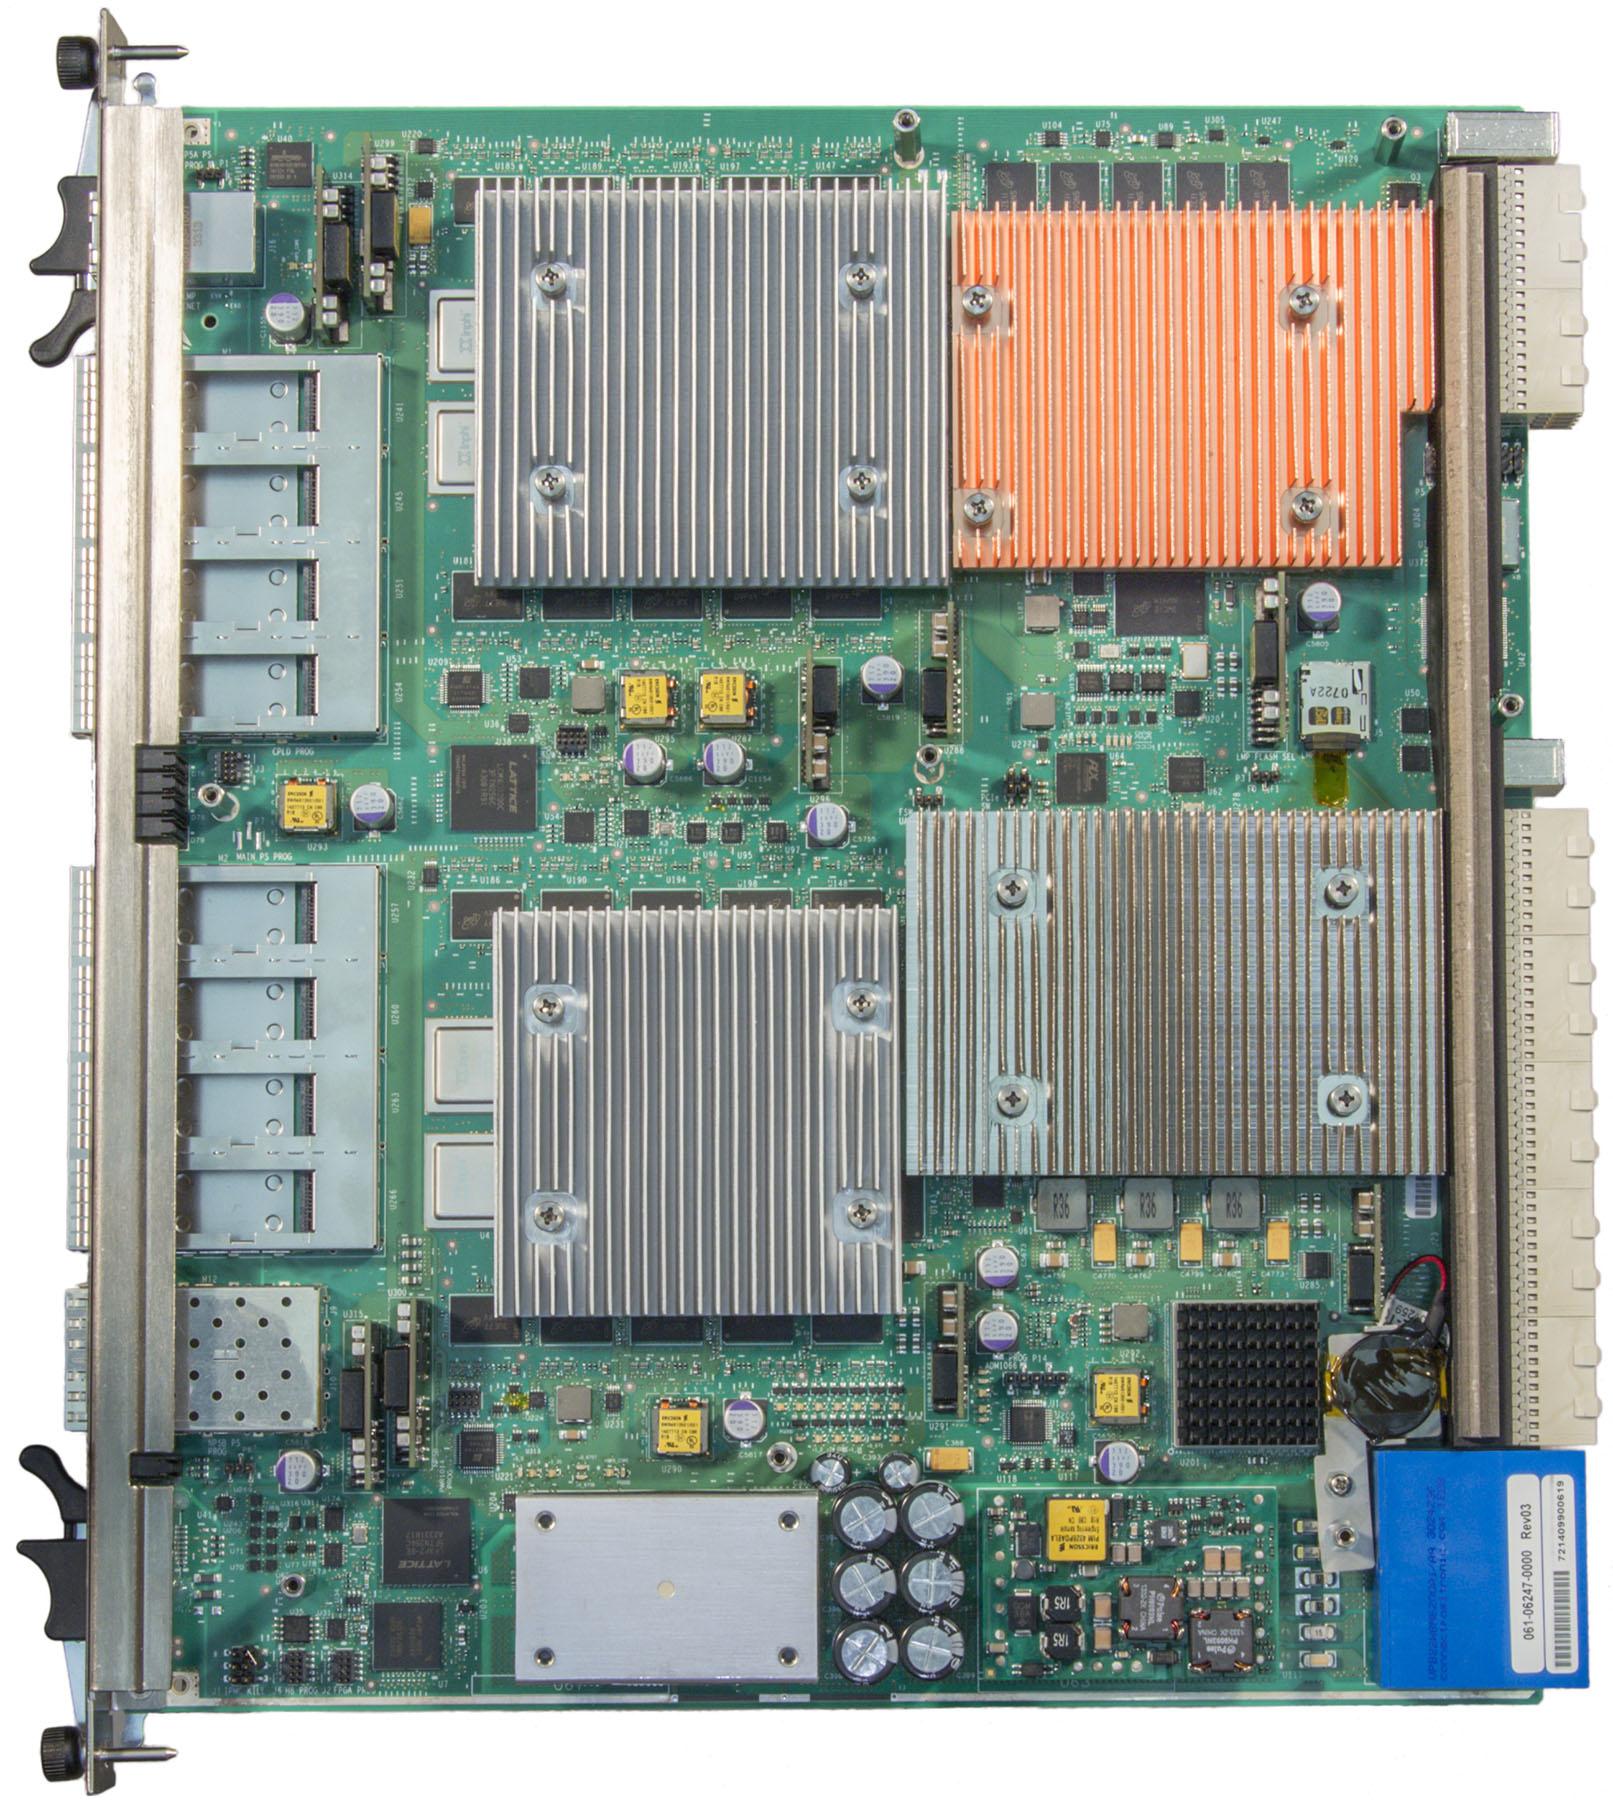 ATCA-2470 (NPX) Intelligent Hub Switch